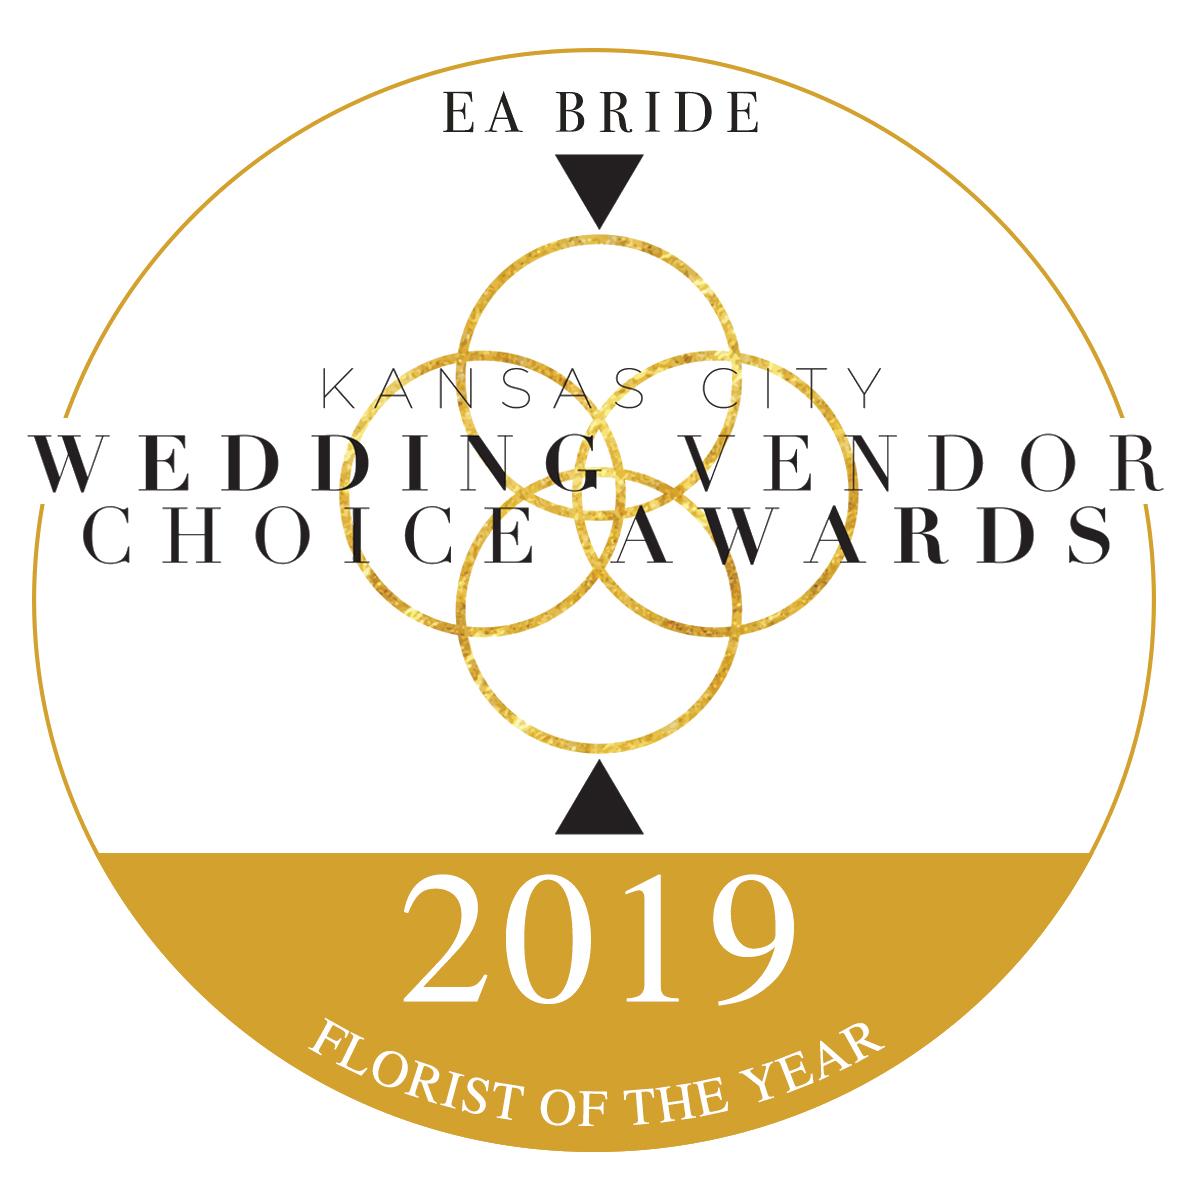 KC Wedding Vendor Choice Awards   2019 Florist of the Year